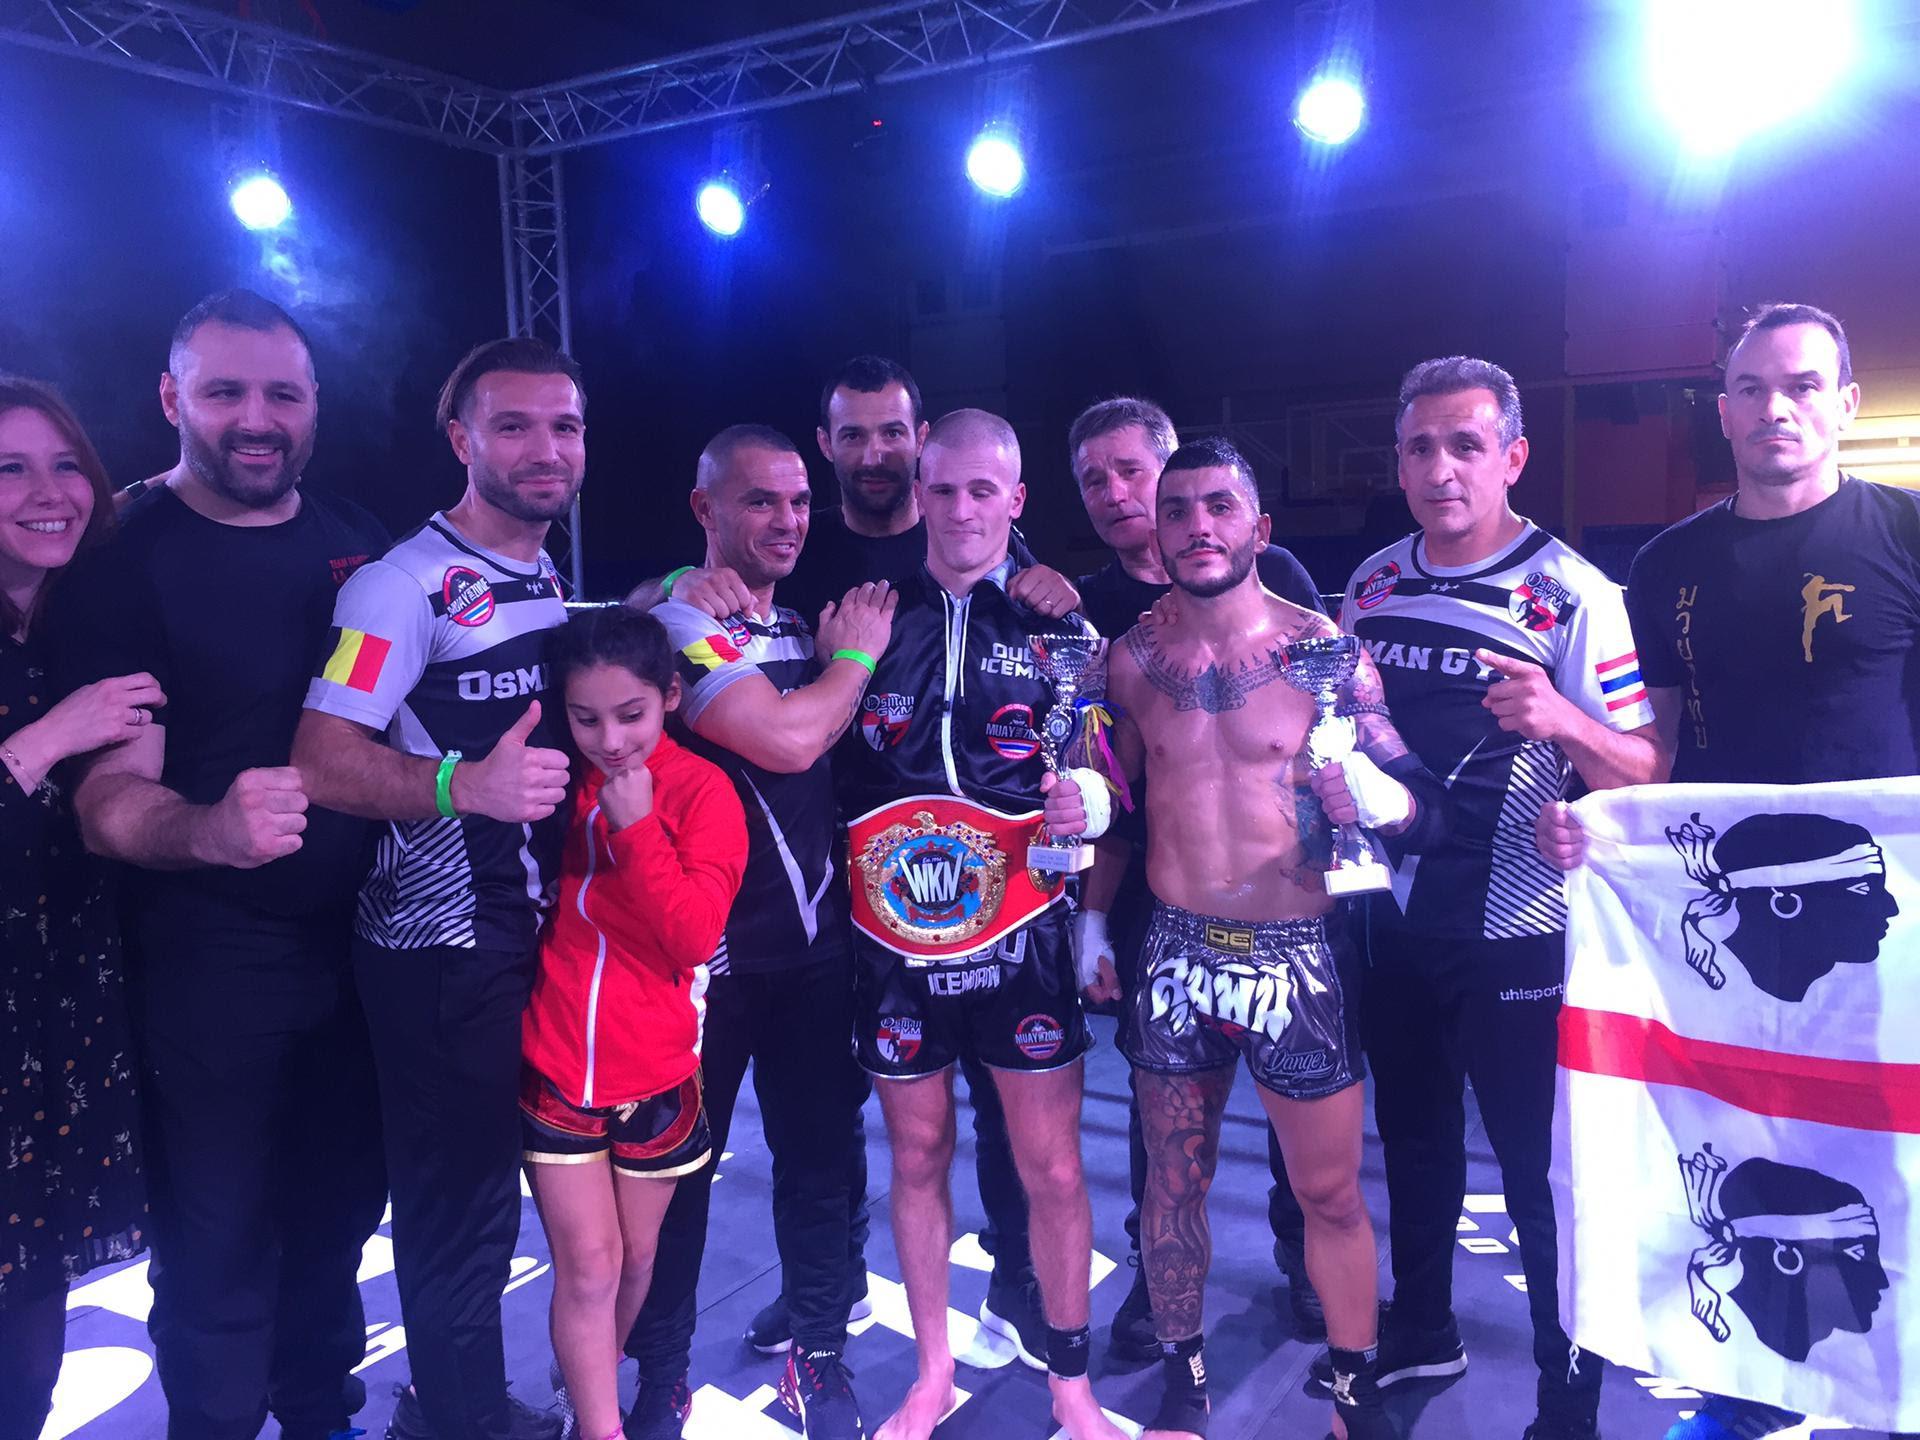 Ougo Huet earns WKN European Featherweight title in Muay Thai - World Kickboxing